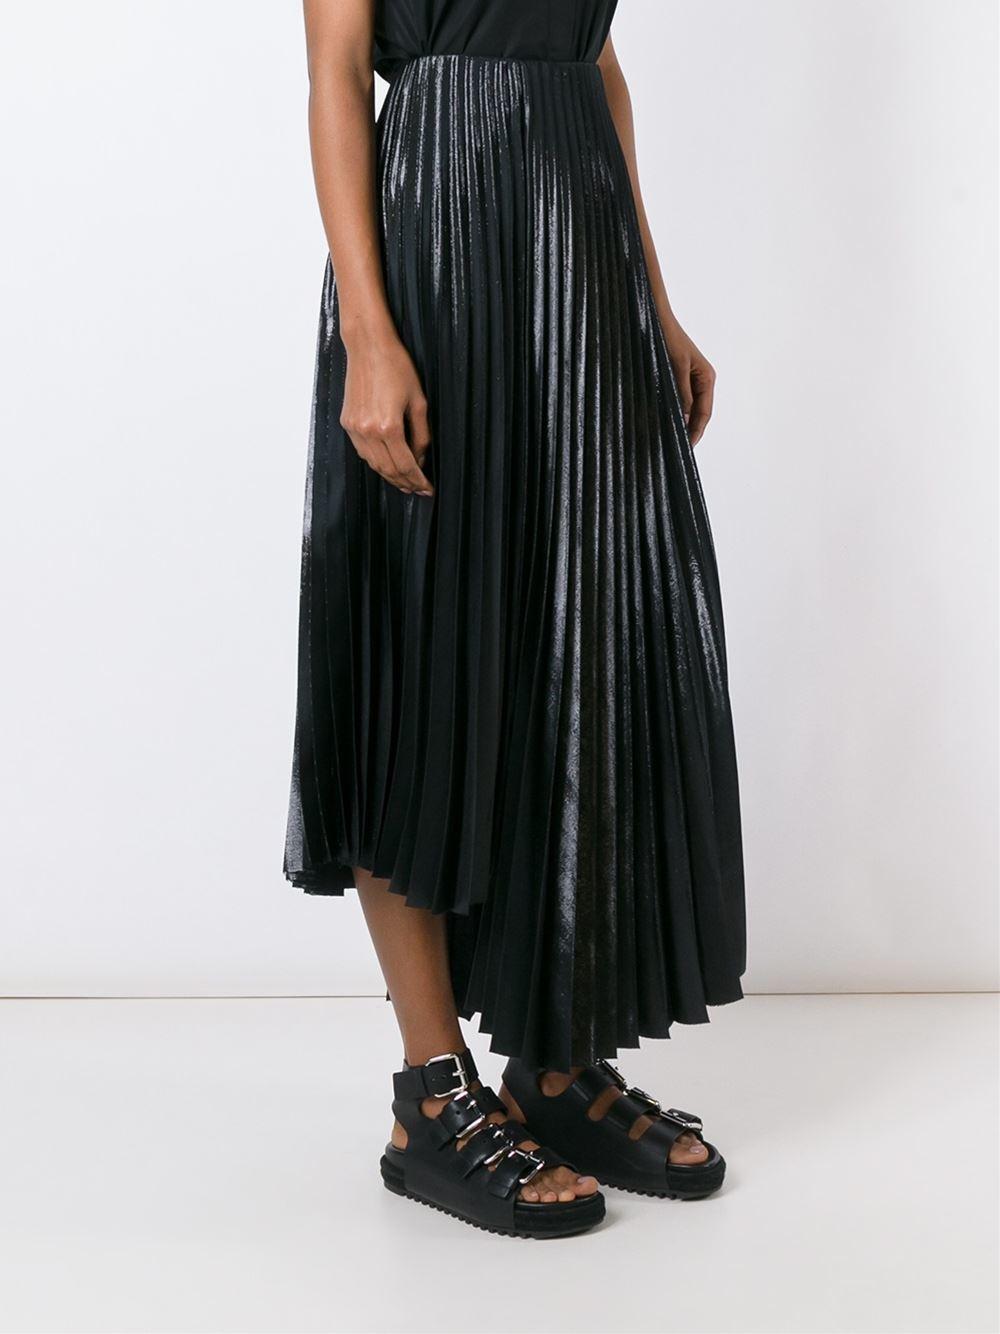 Y's yohji yamamoto Lurex Effect Pleated Skirt in Black